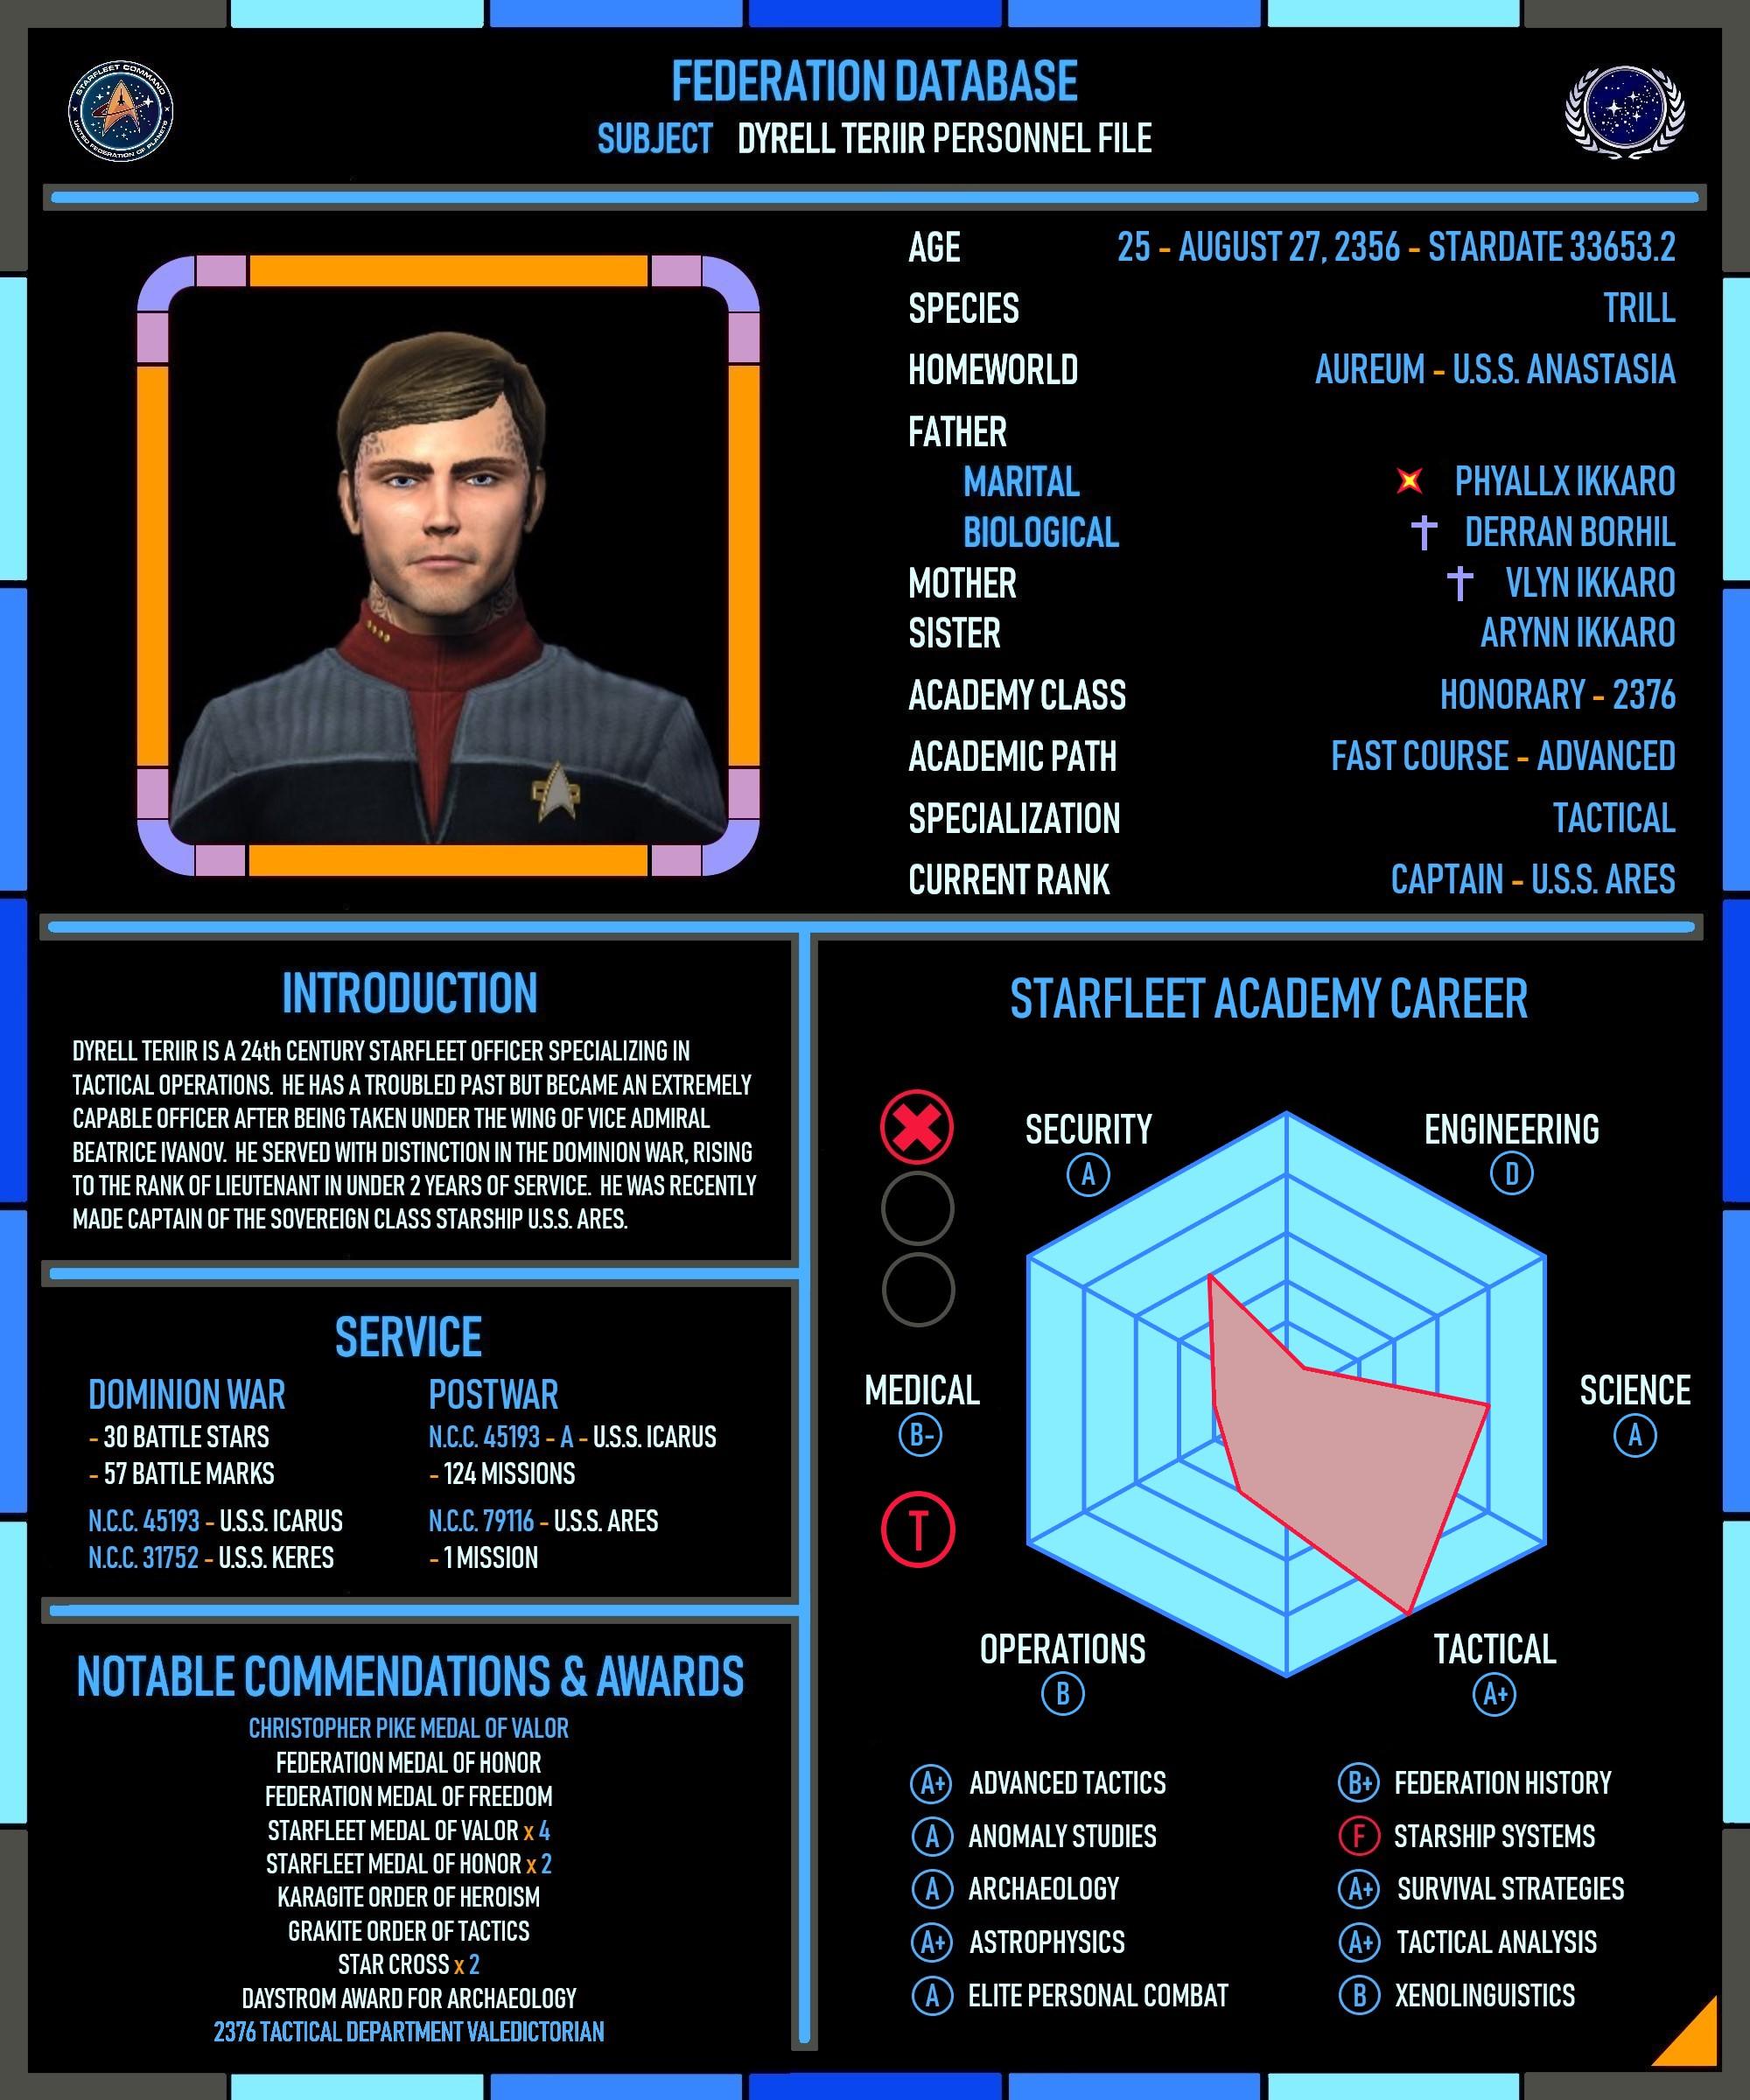 Name:  Dyrell Teriir Personnel File - 2.jpg Views: 192 Size:  782.1 KB